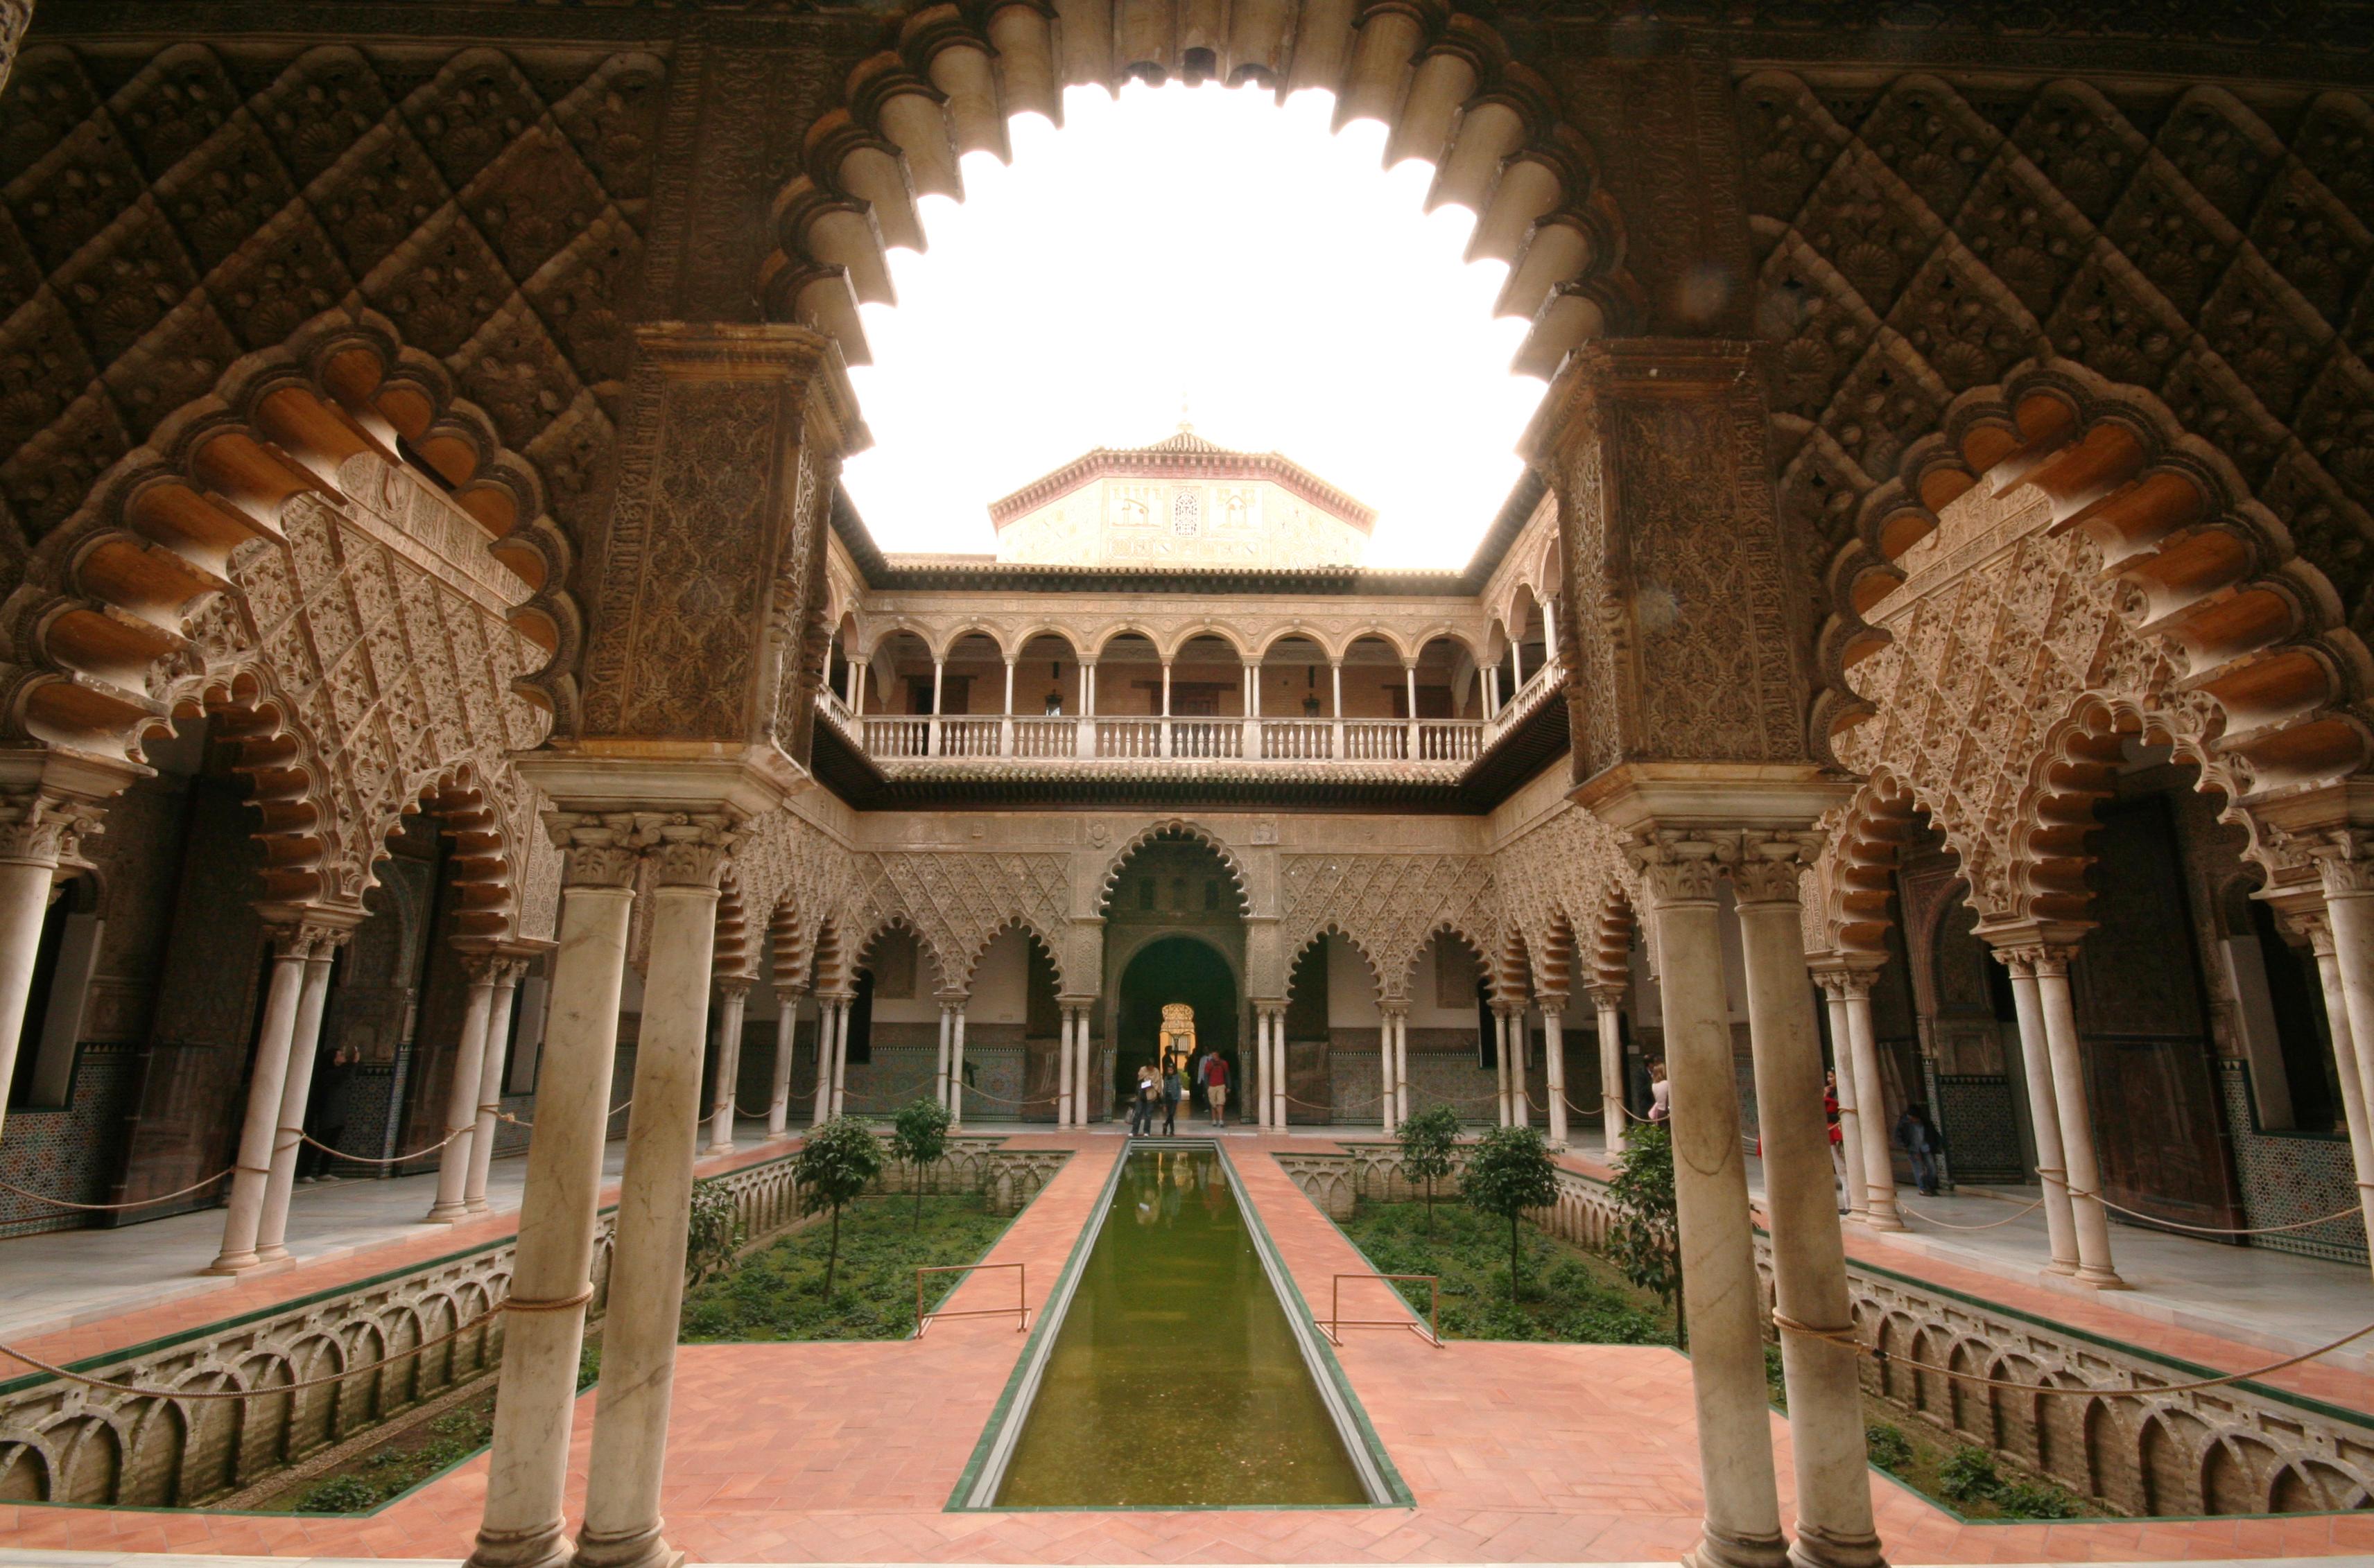 Real Alcázar de Sevilla - Juego de tronos